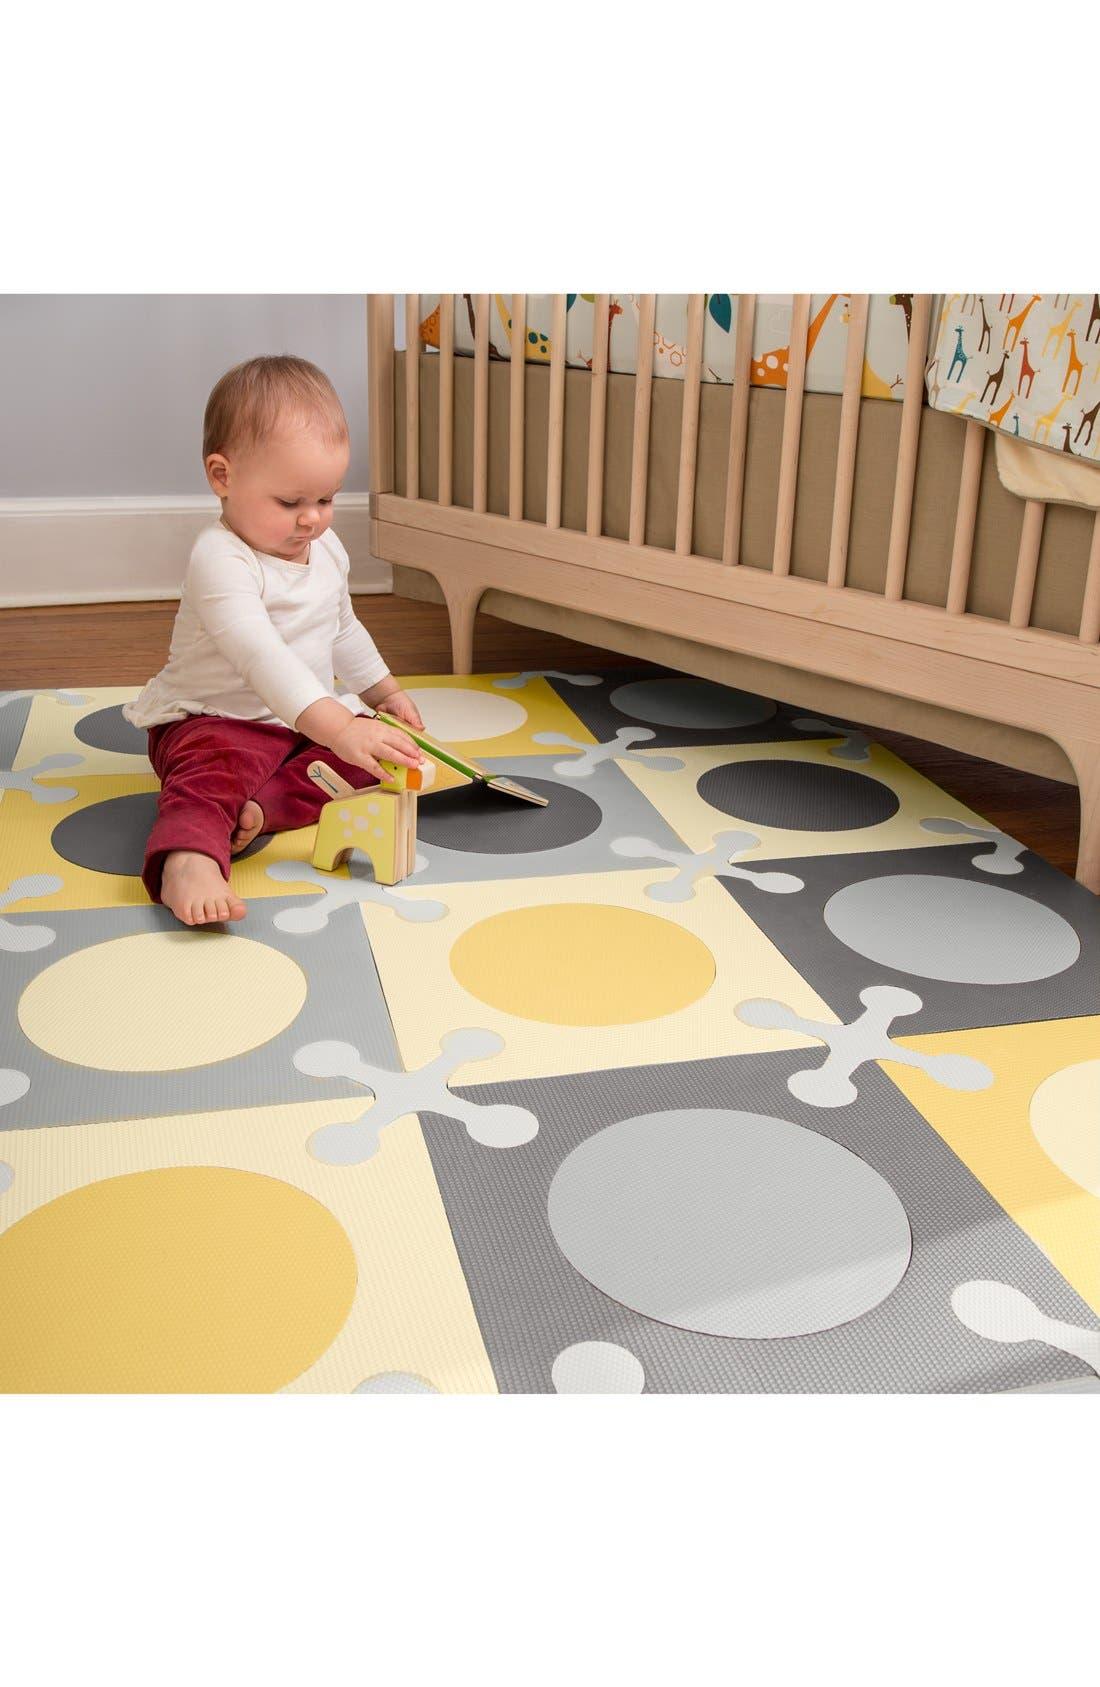 'Playspot' Floor Tiles,                             Alternate thumbnail 4, color,                             Gray/ Gold